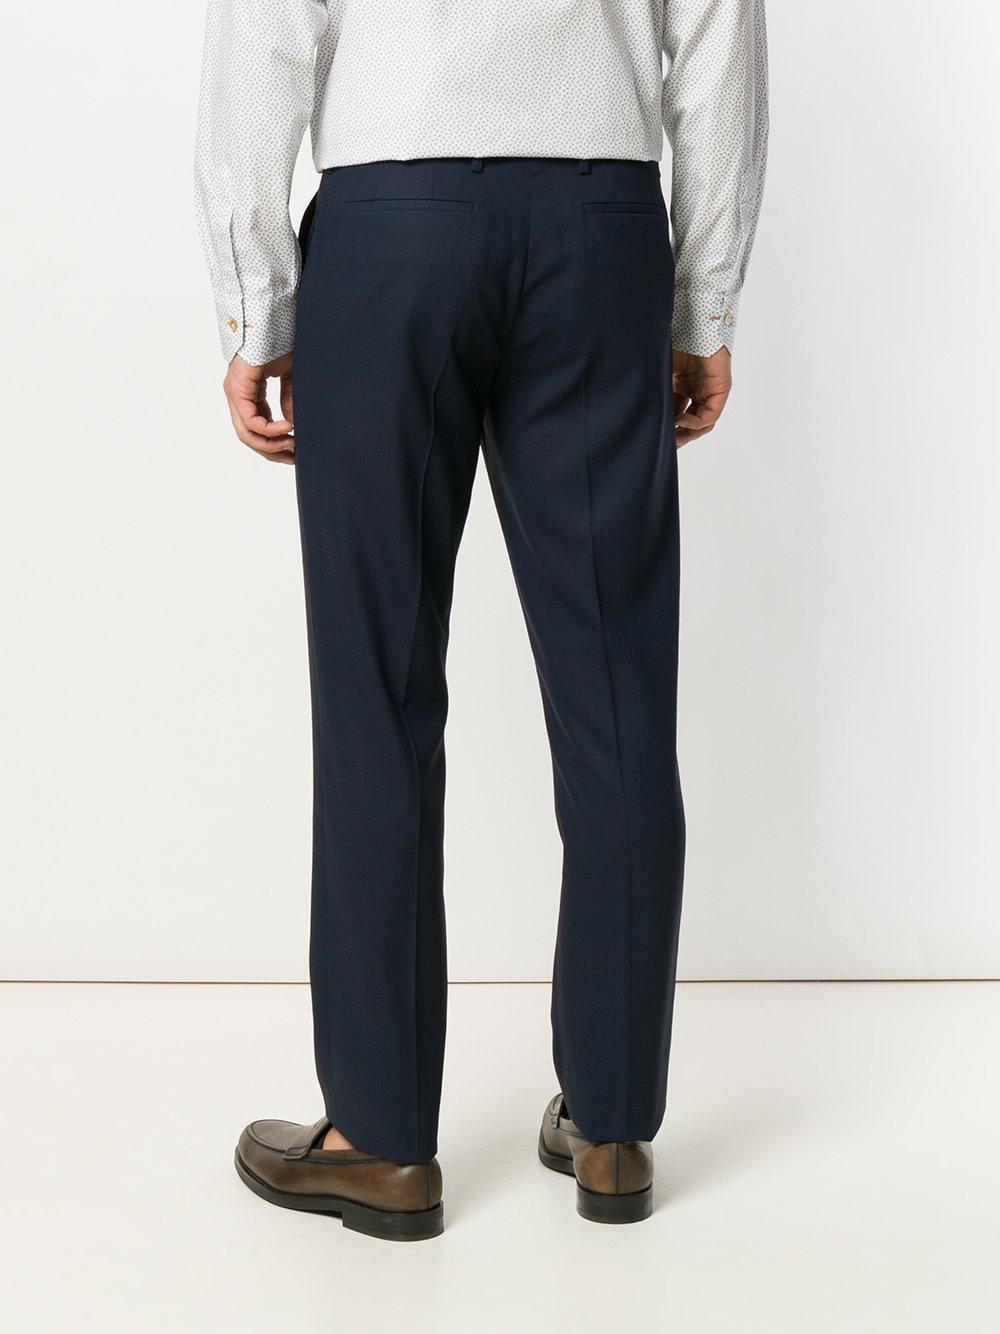 Paul Smith Wool Slim Fit Loro Piana Trousers in Blue for Men